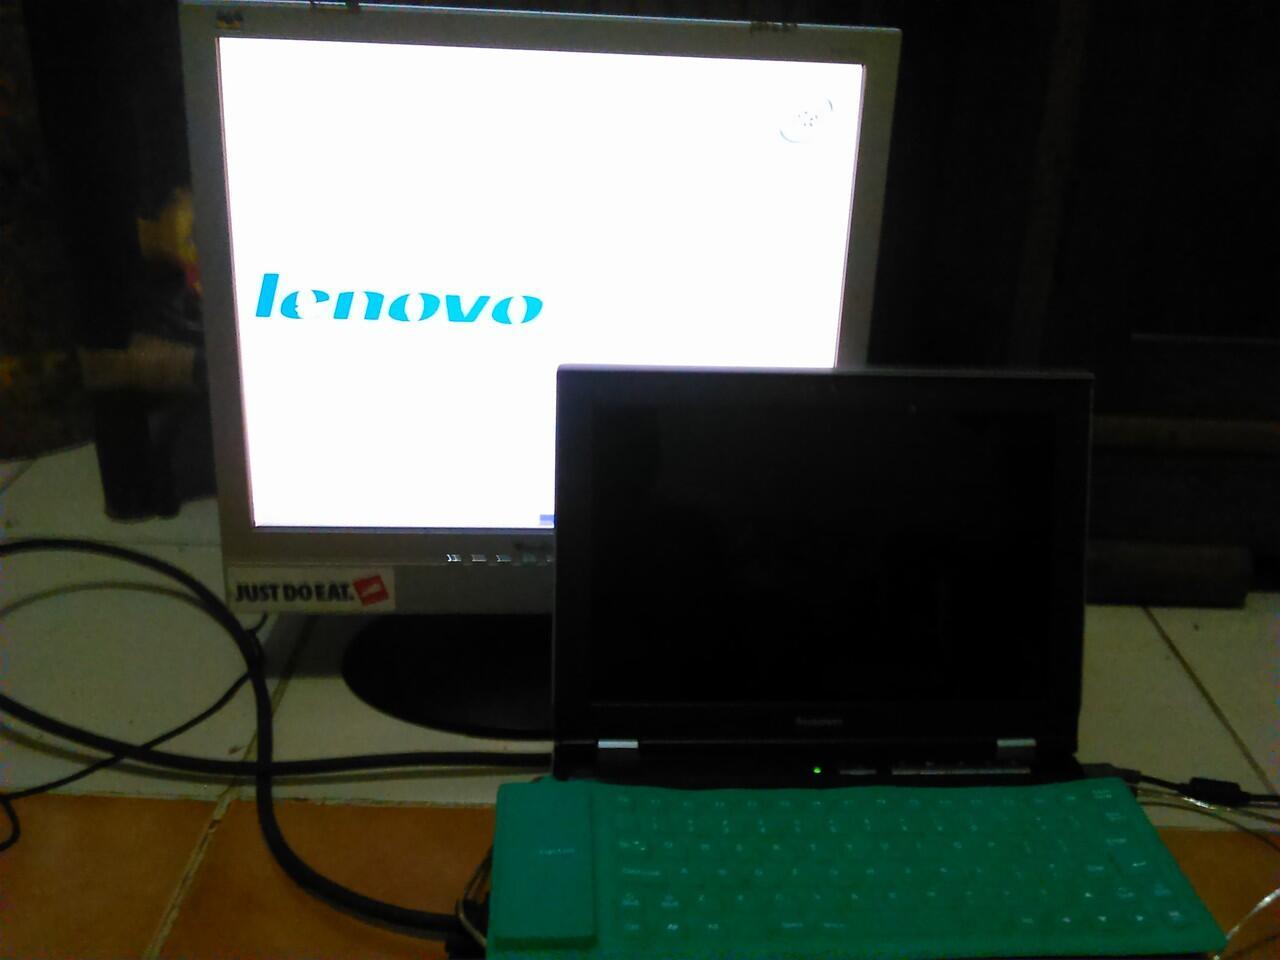 Pretelan laptop lenovo 3000 v200 mobo hidup normal [bogor]